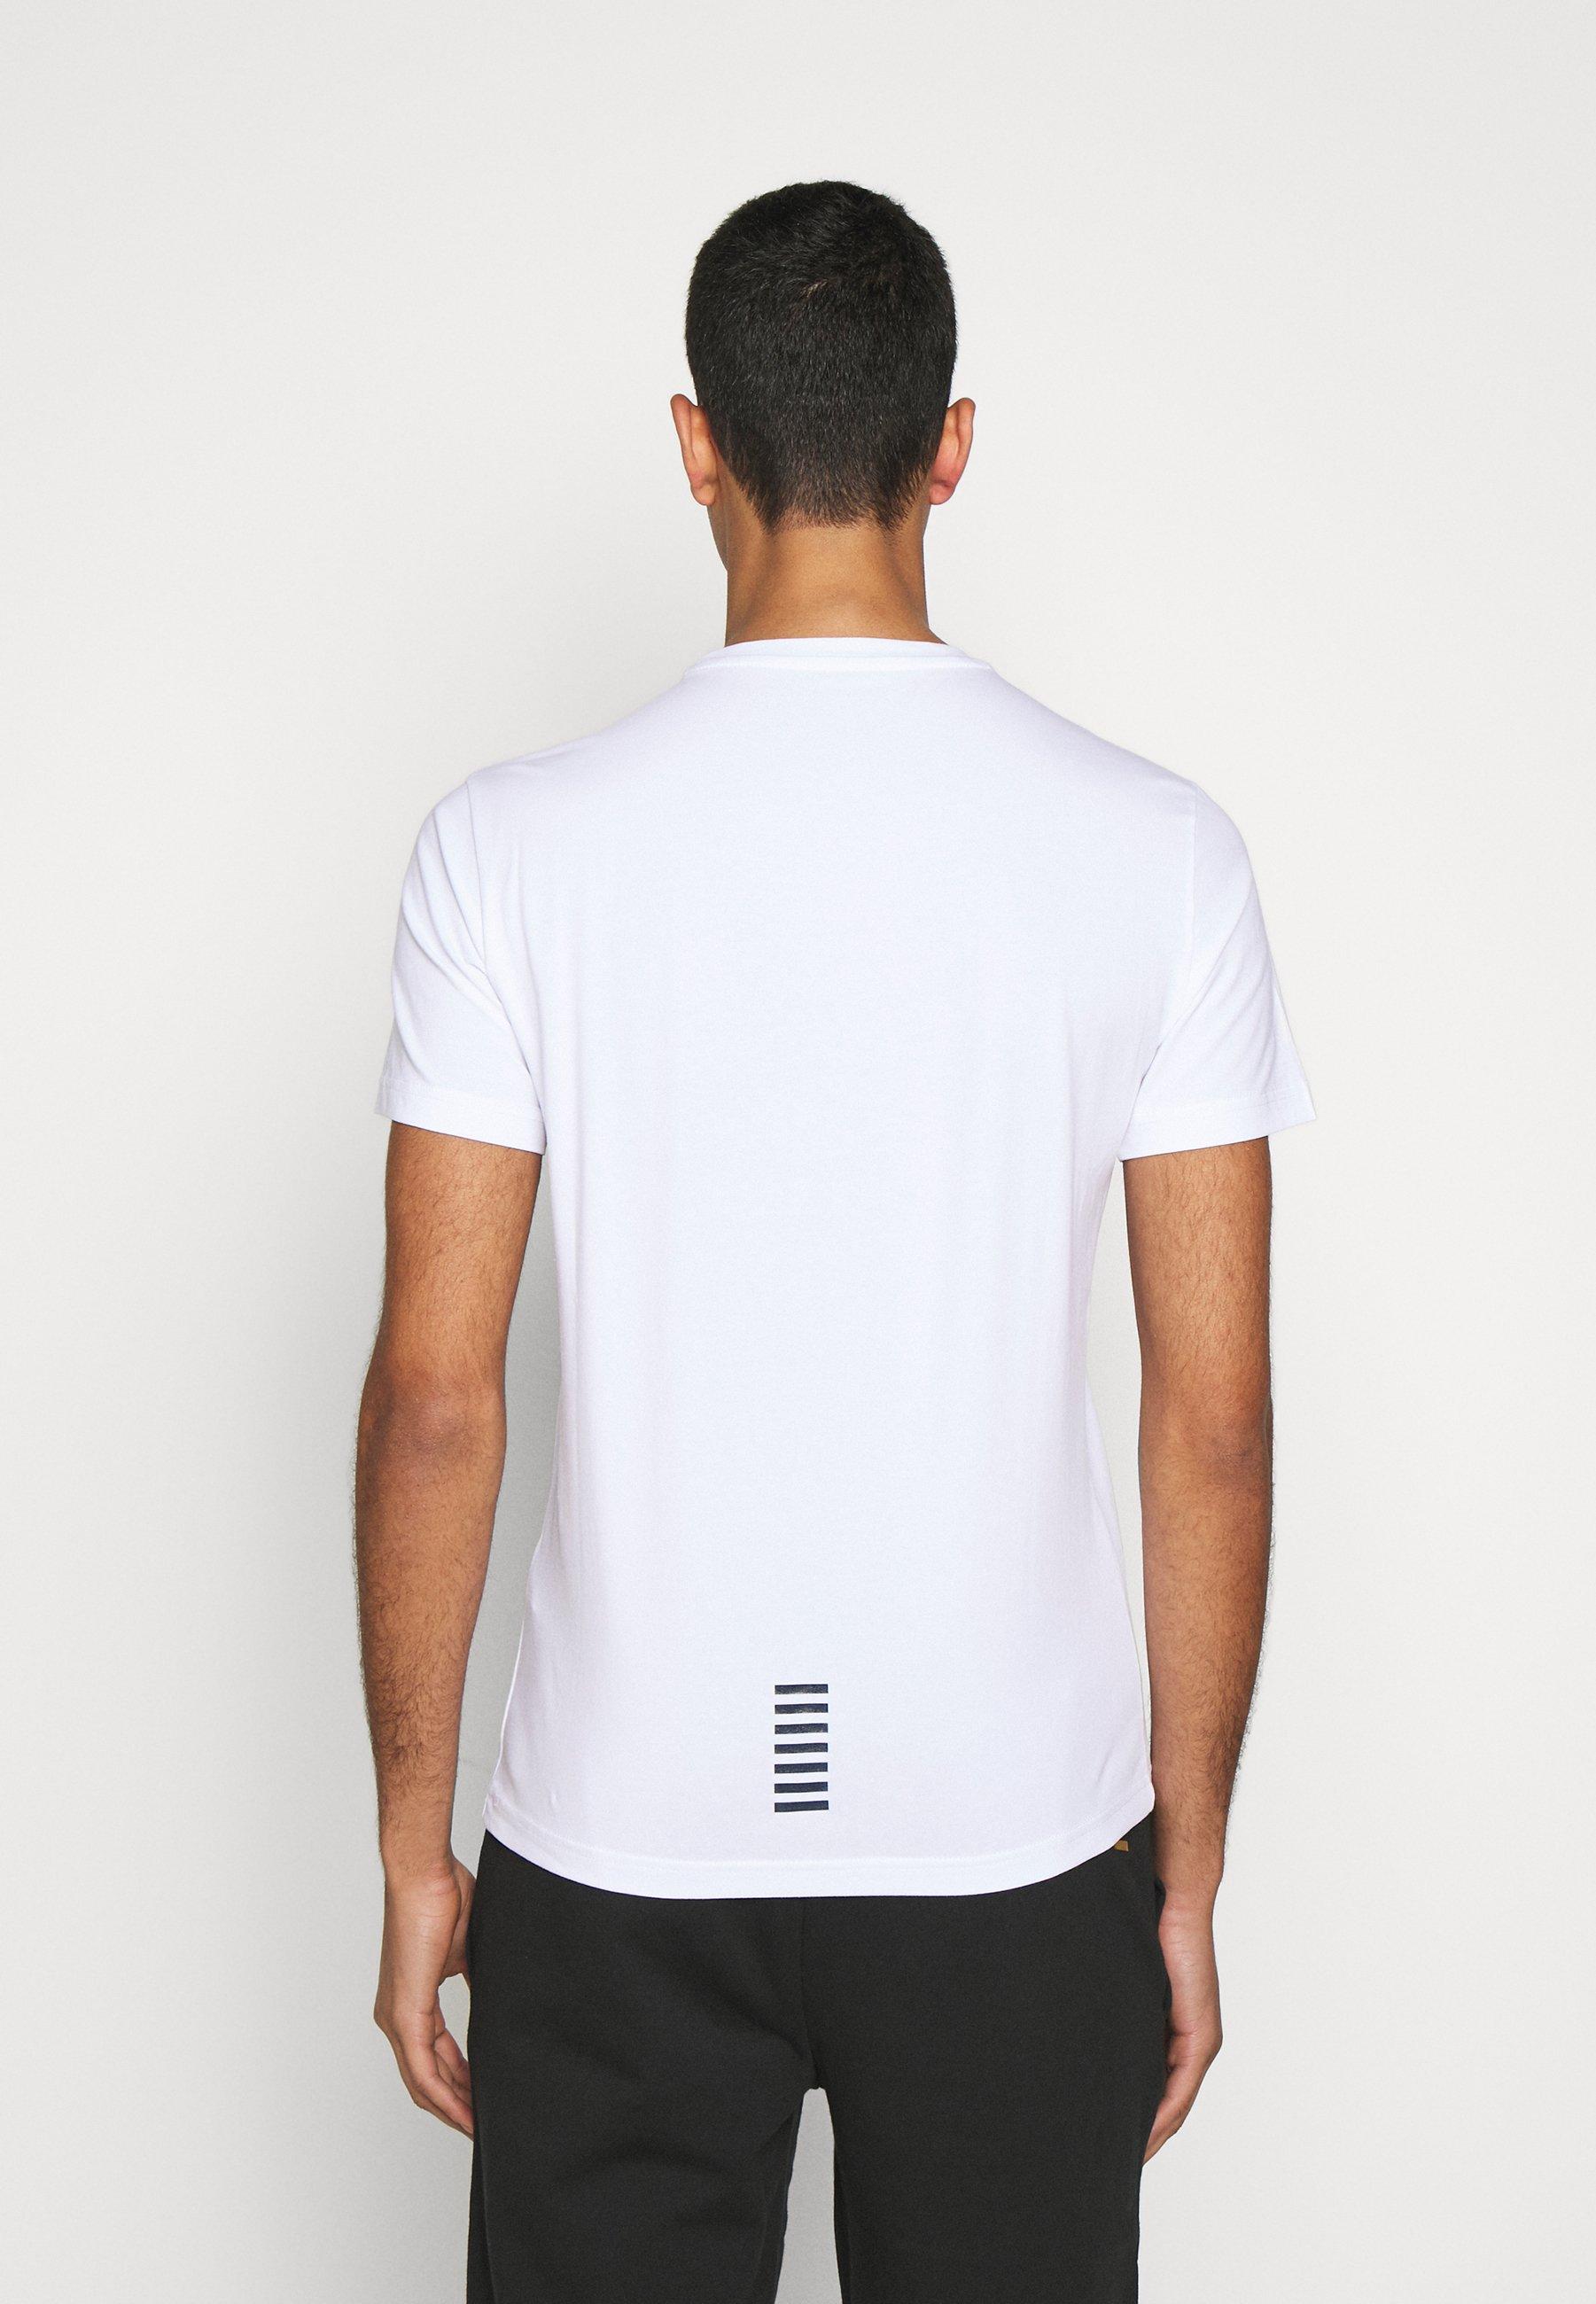 EA7 Emporio Armani Print T-shirt - white sRdHA